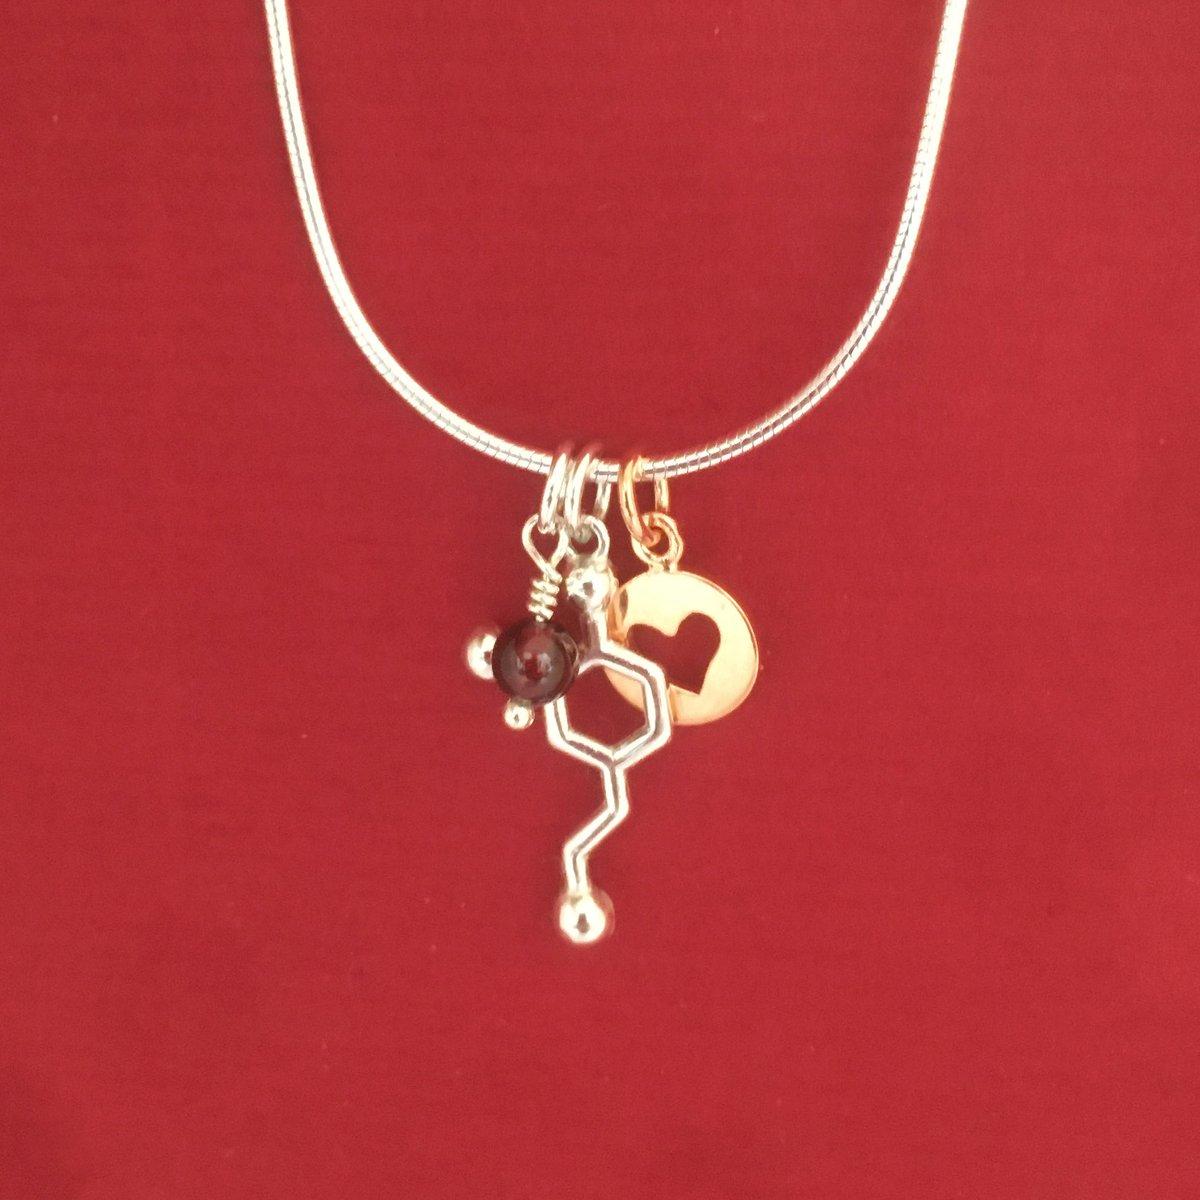 Image of dopamine heart necklace